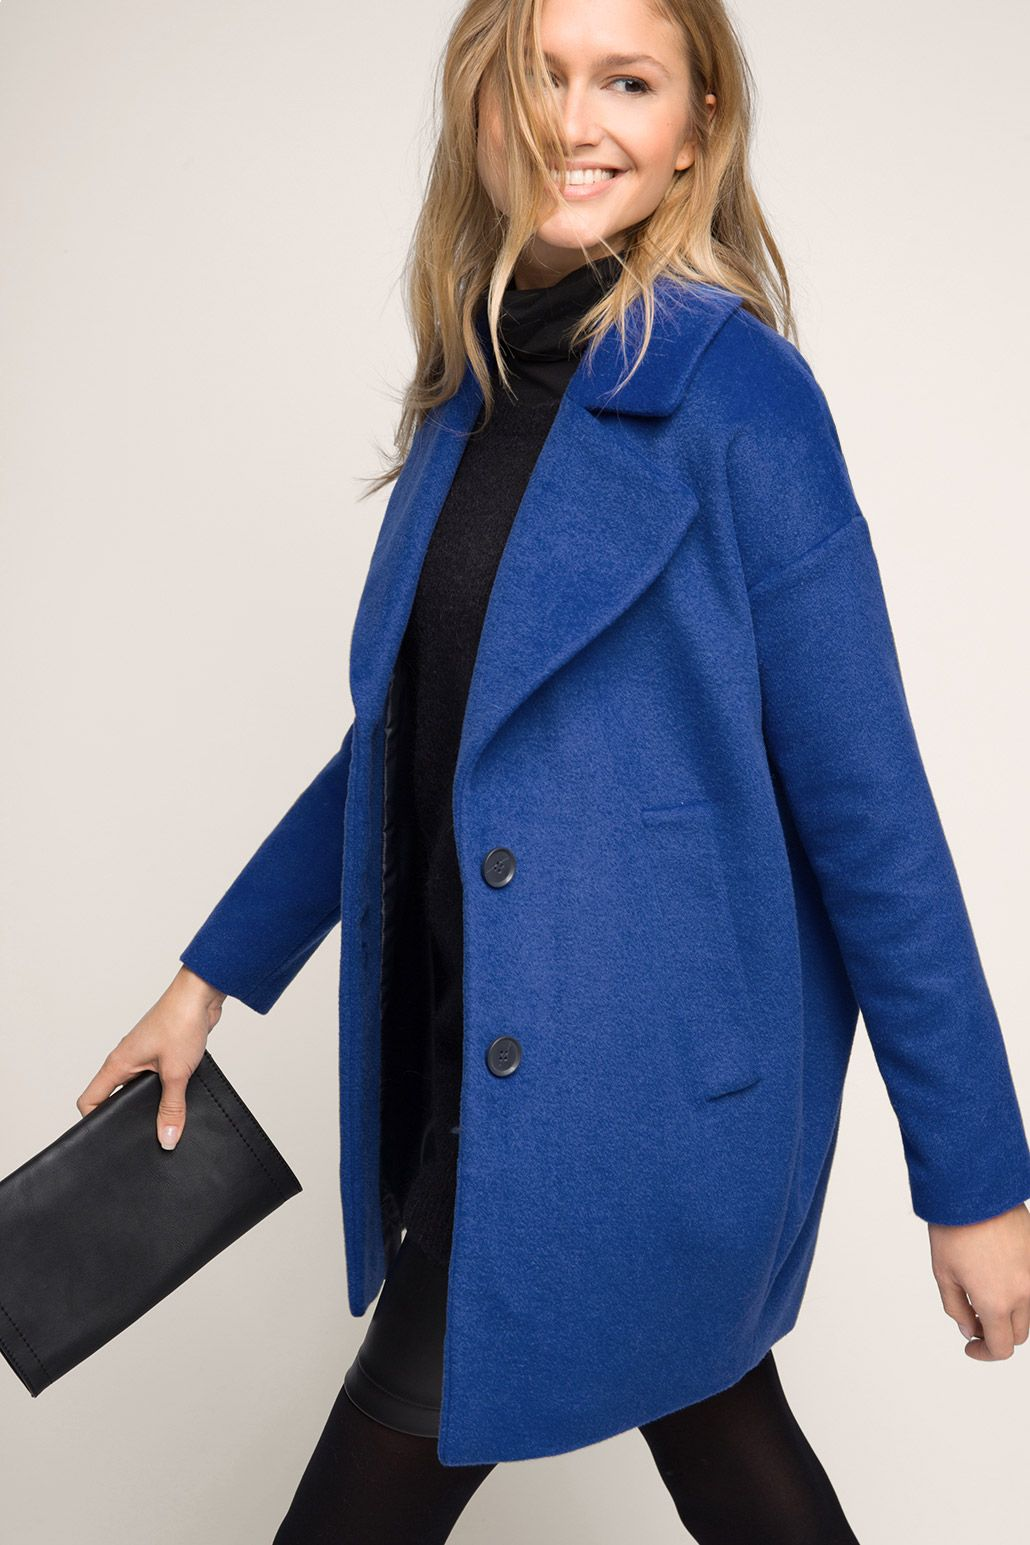 Wide Oversized Coat In A Wool Blend Oversized Coat Coat Clothes [ 1545 x 1030 Pixel ]